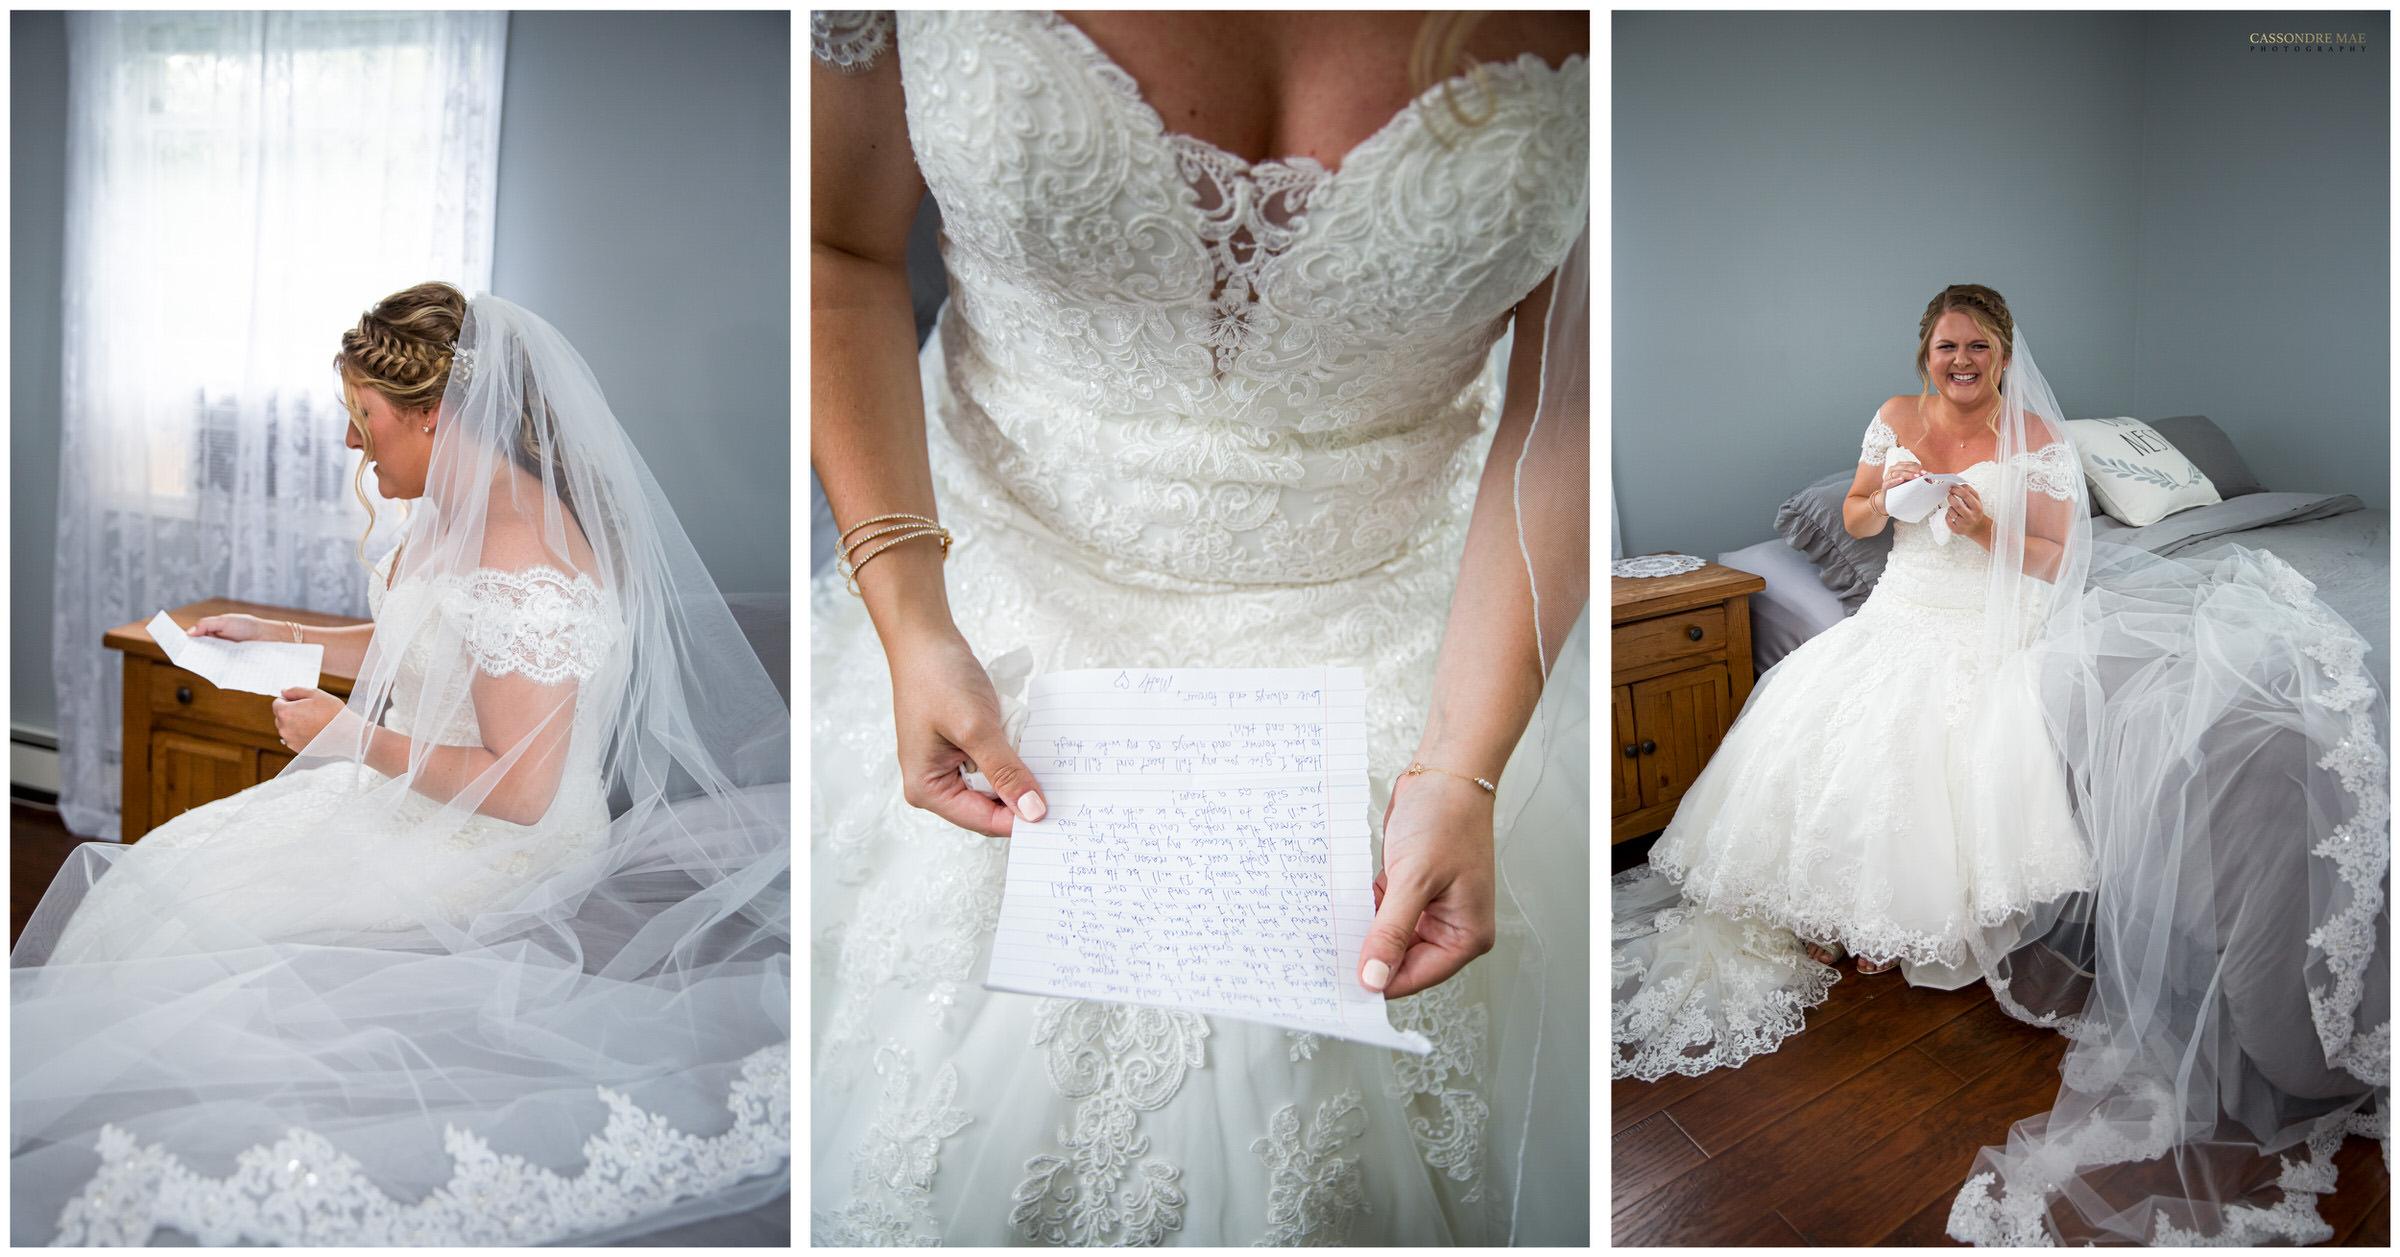 Cassondre Mae Photography The Links Wedding Photographer 10.jpg